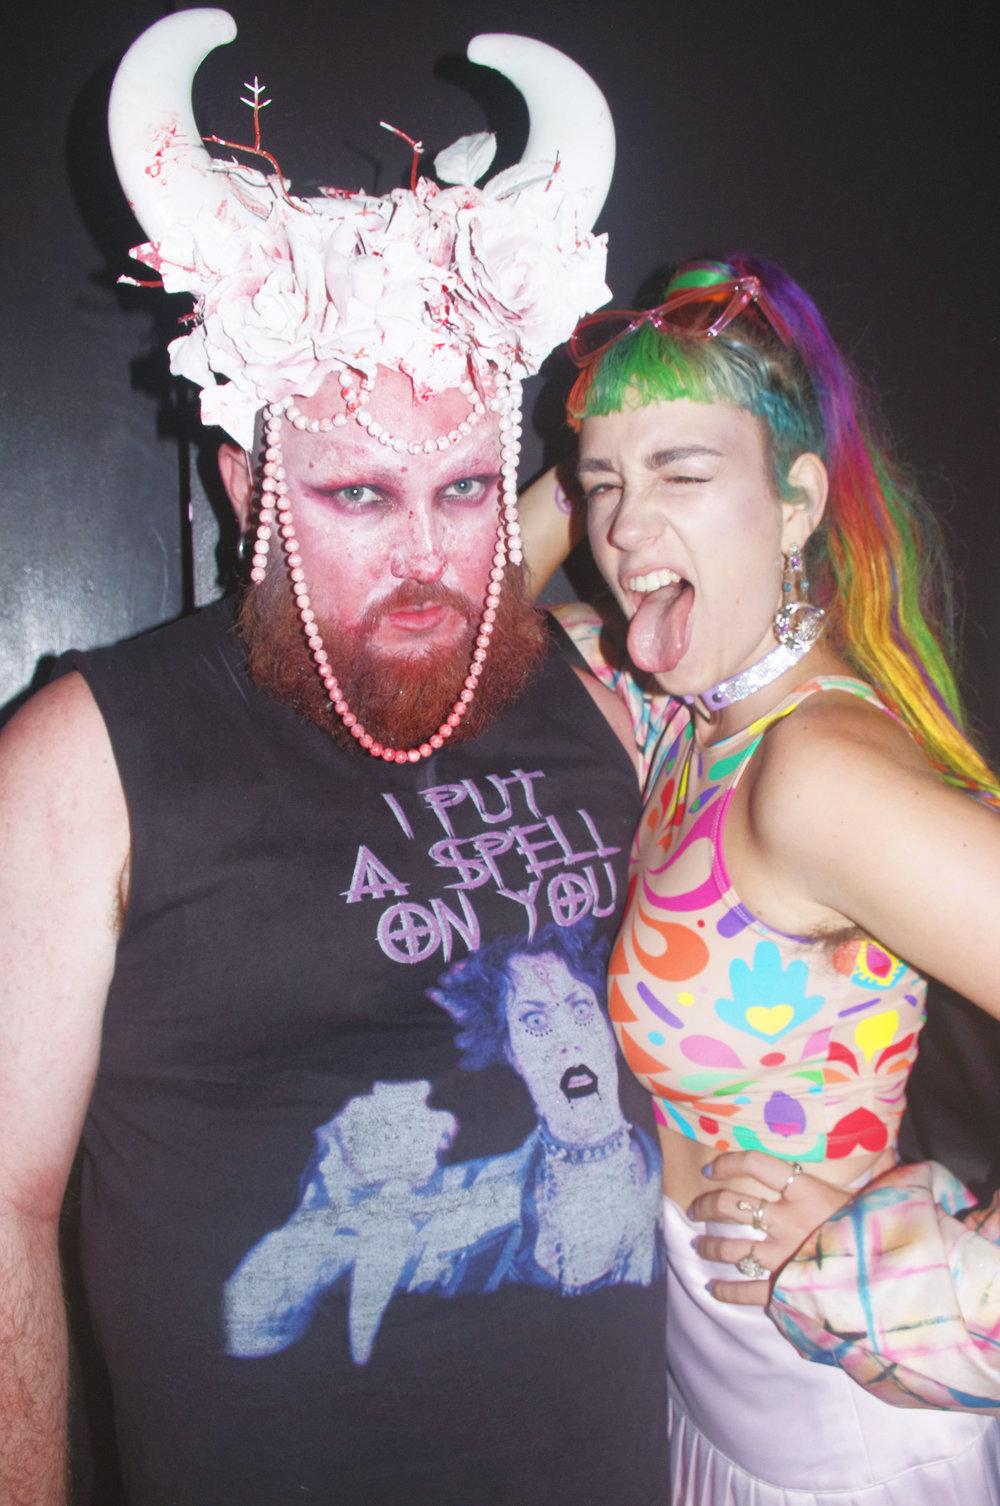 Minnie Taur and Femme as Fuck